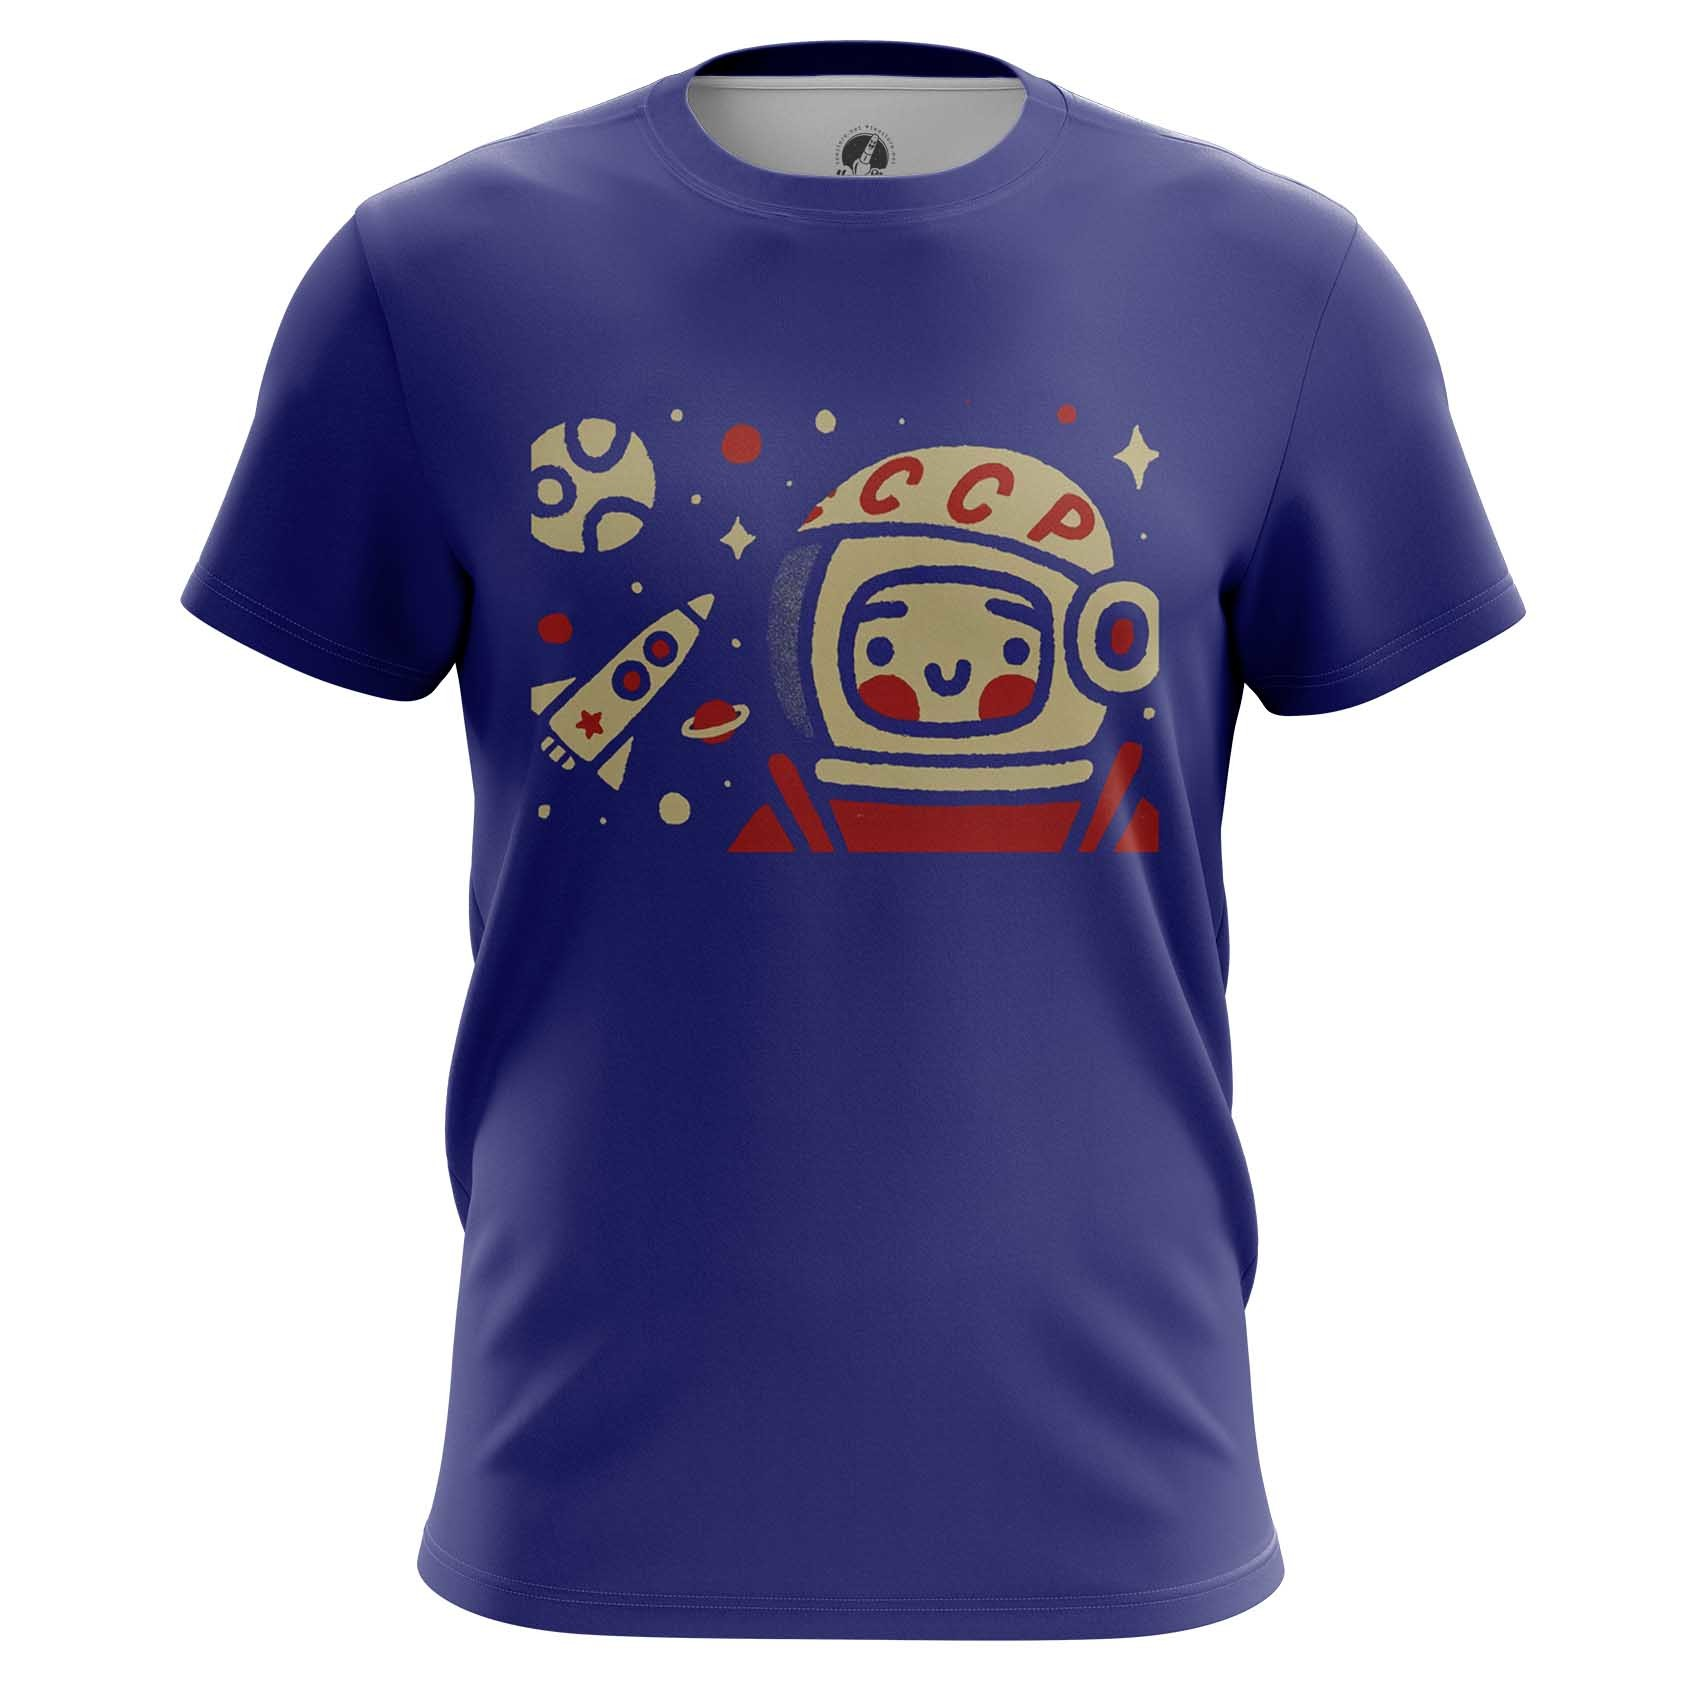 Merchandise Men'S Long Sleeve Yuri Gagarin Space Merch